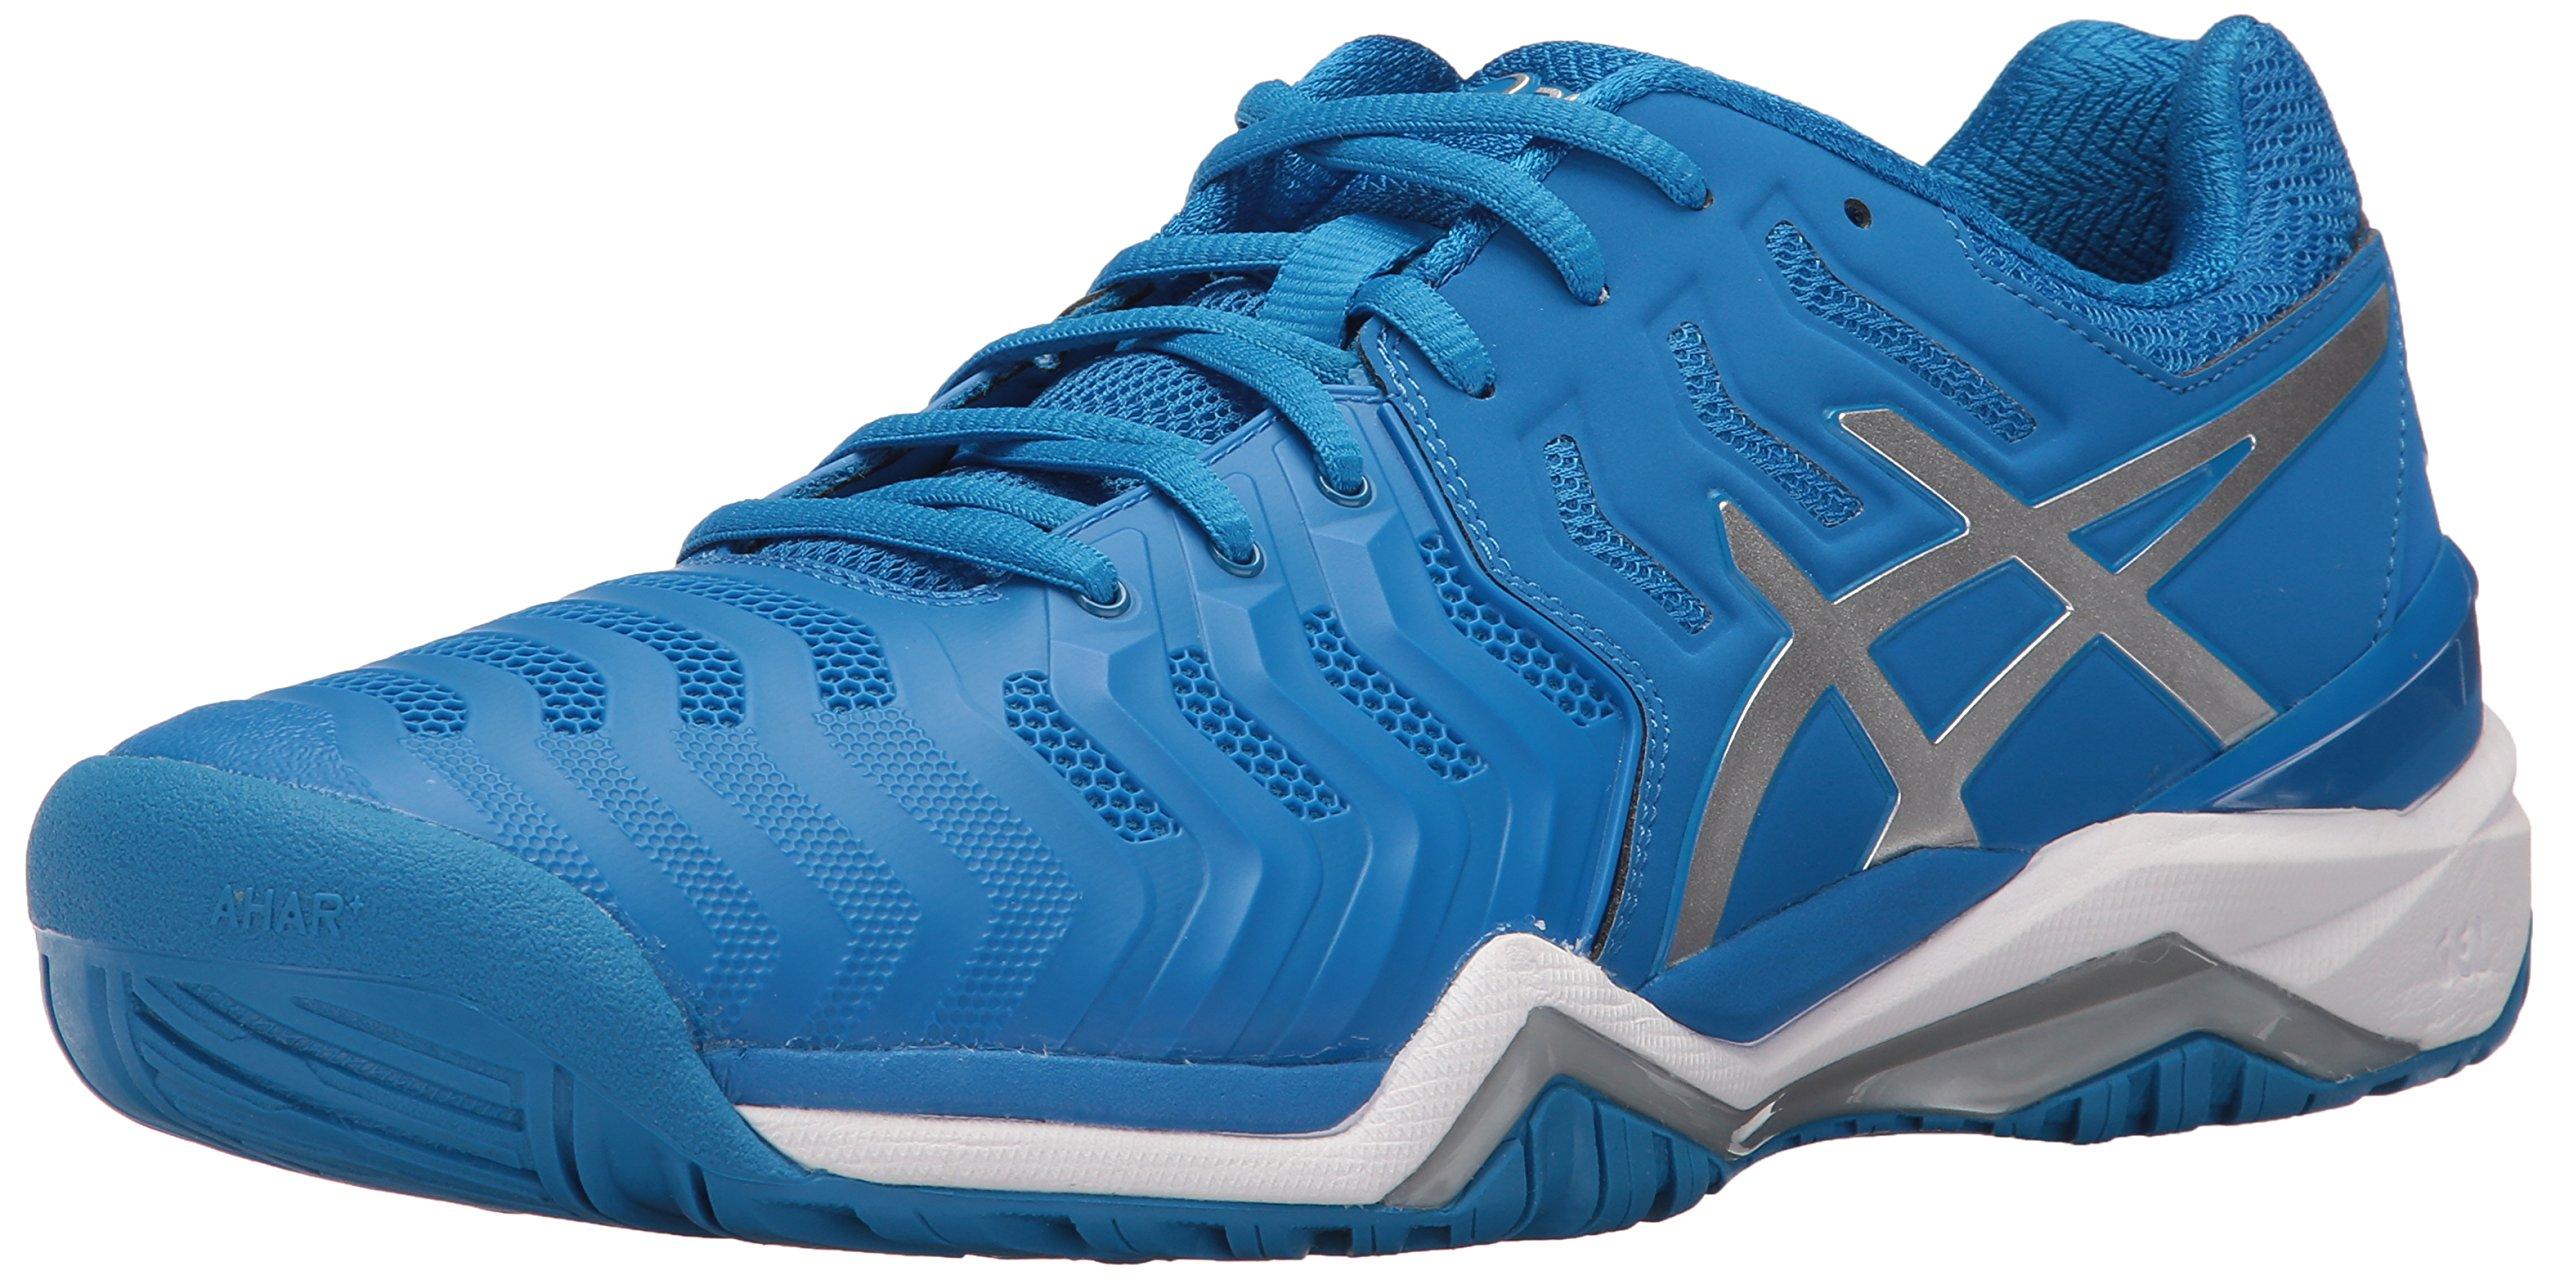 ASICS Mens Gel-Resolution 7 Tennis Shoe Directoire Blue/Silver/White 6 Medium US